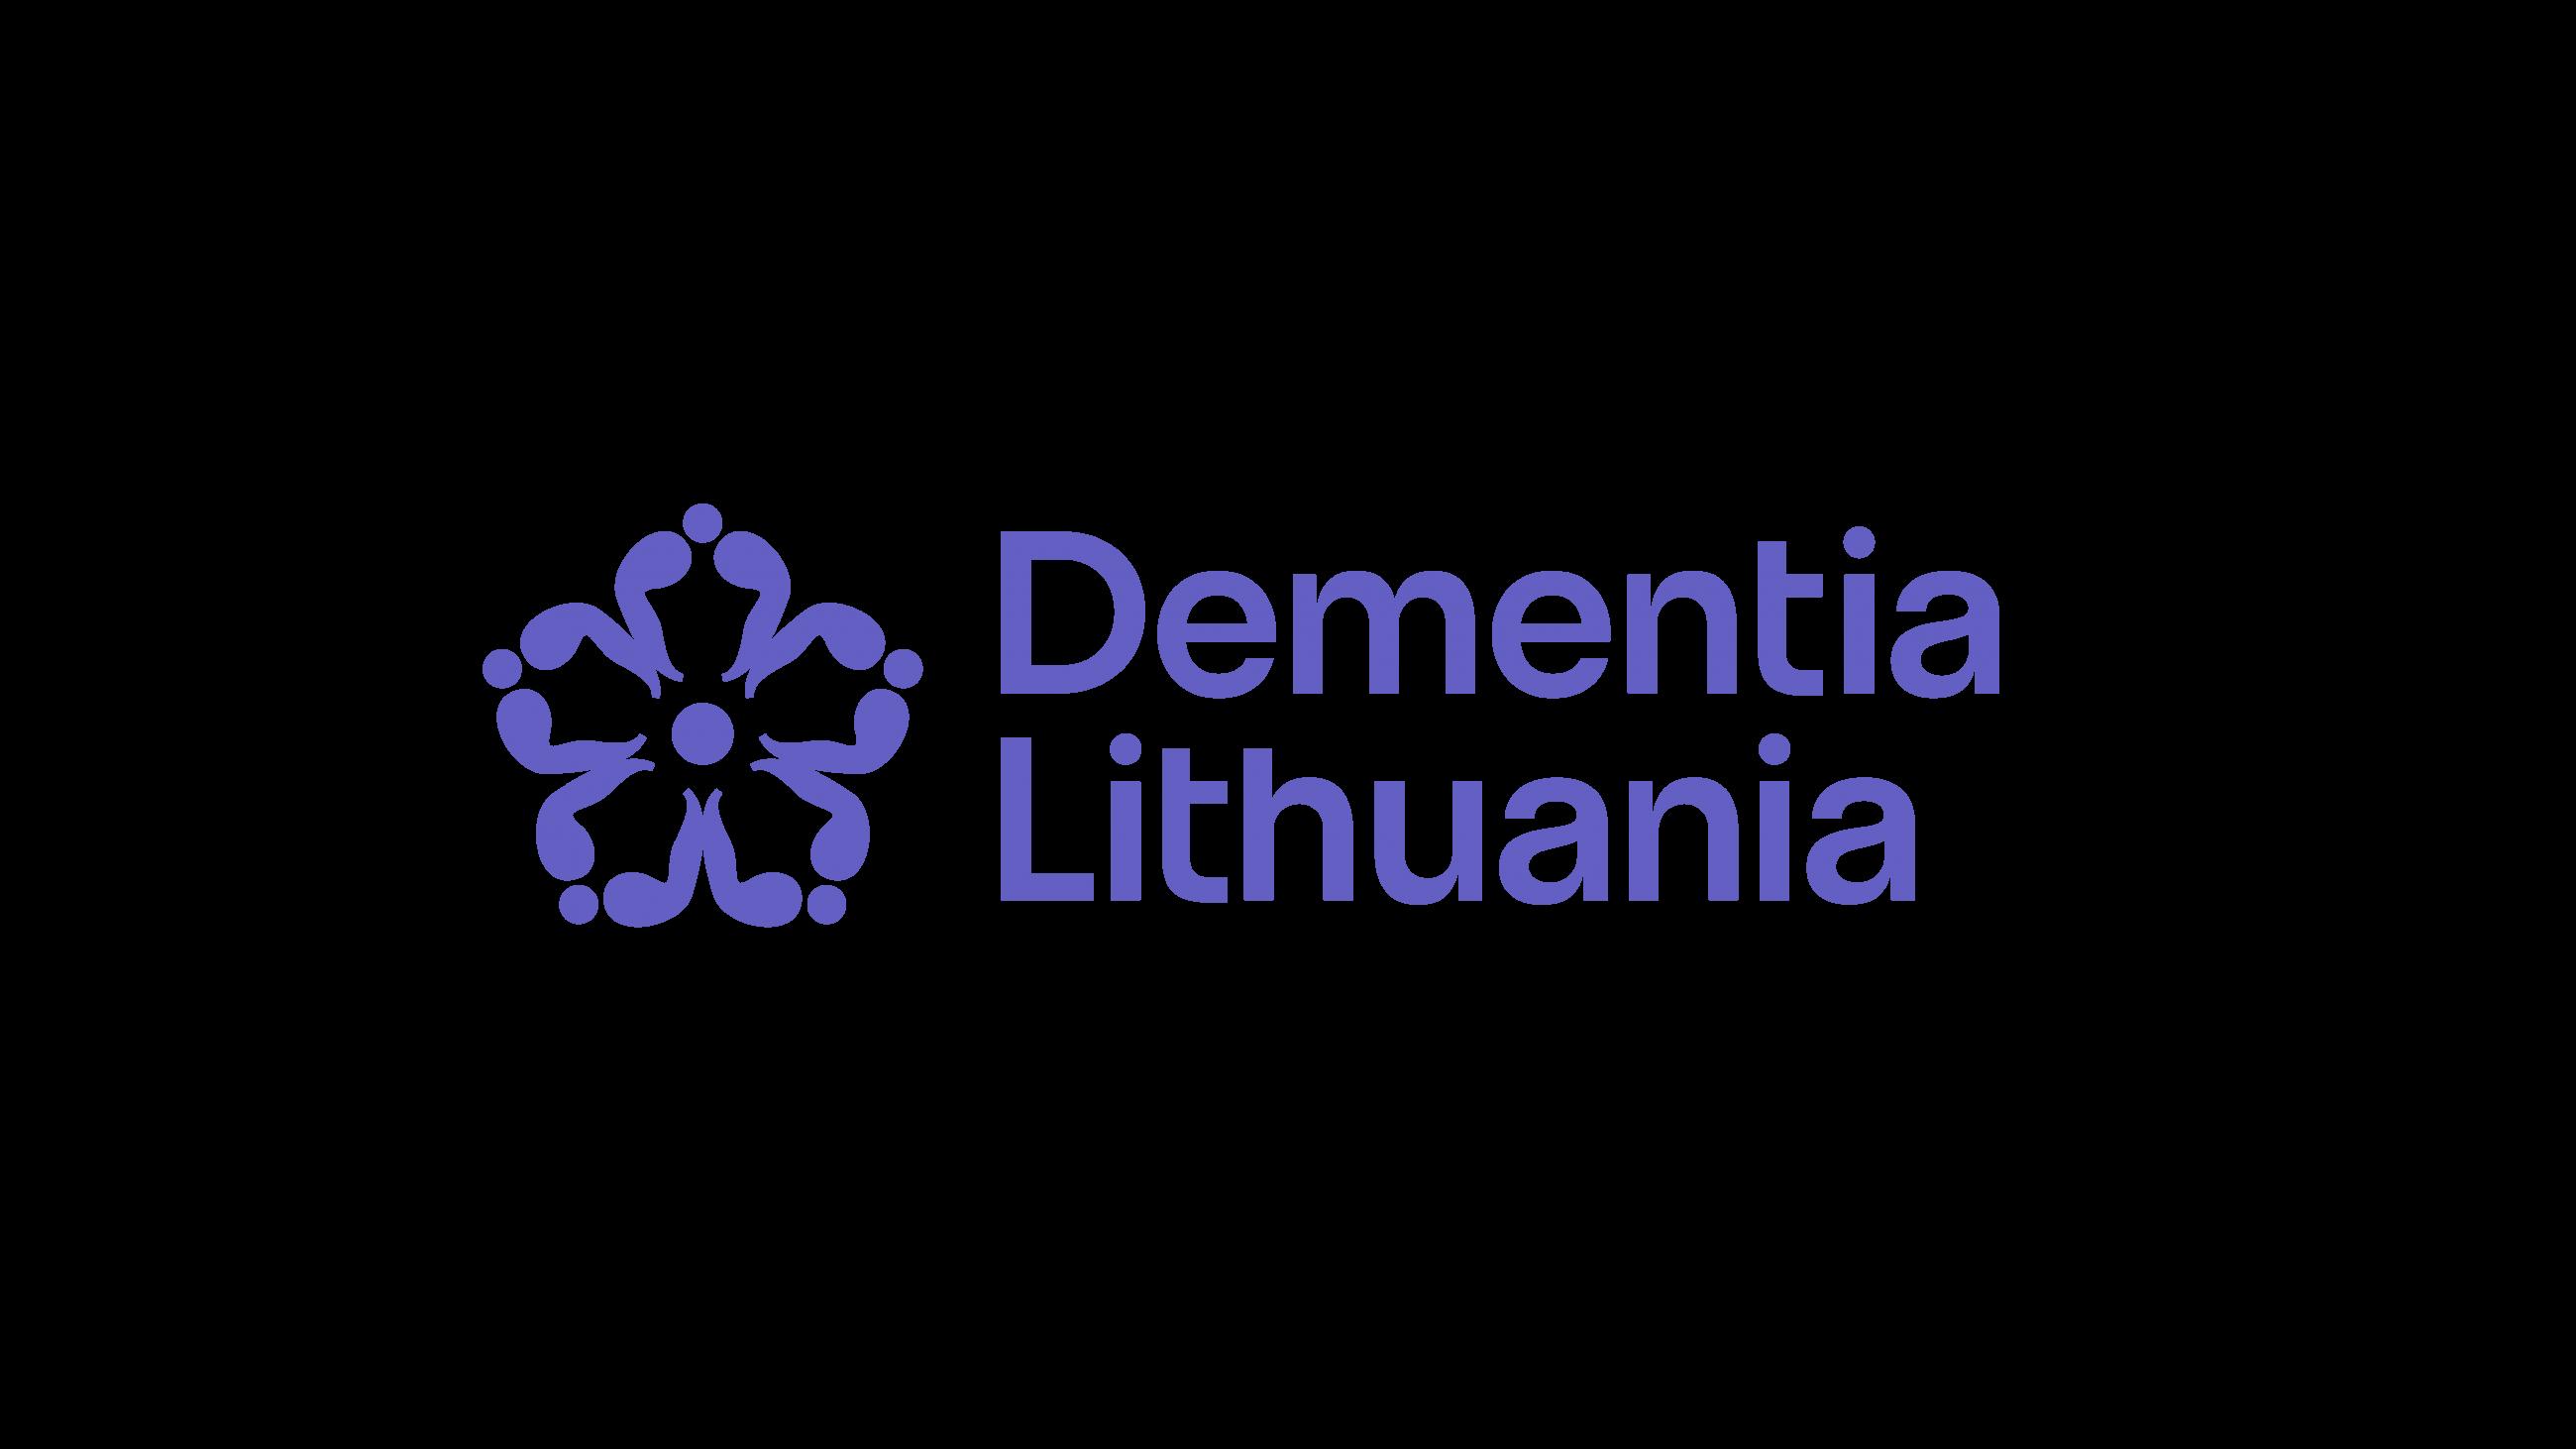 Dementia Lithuania logo